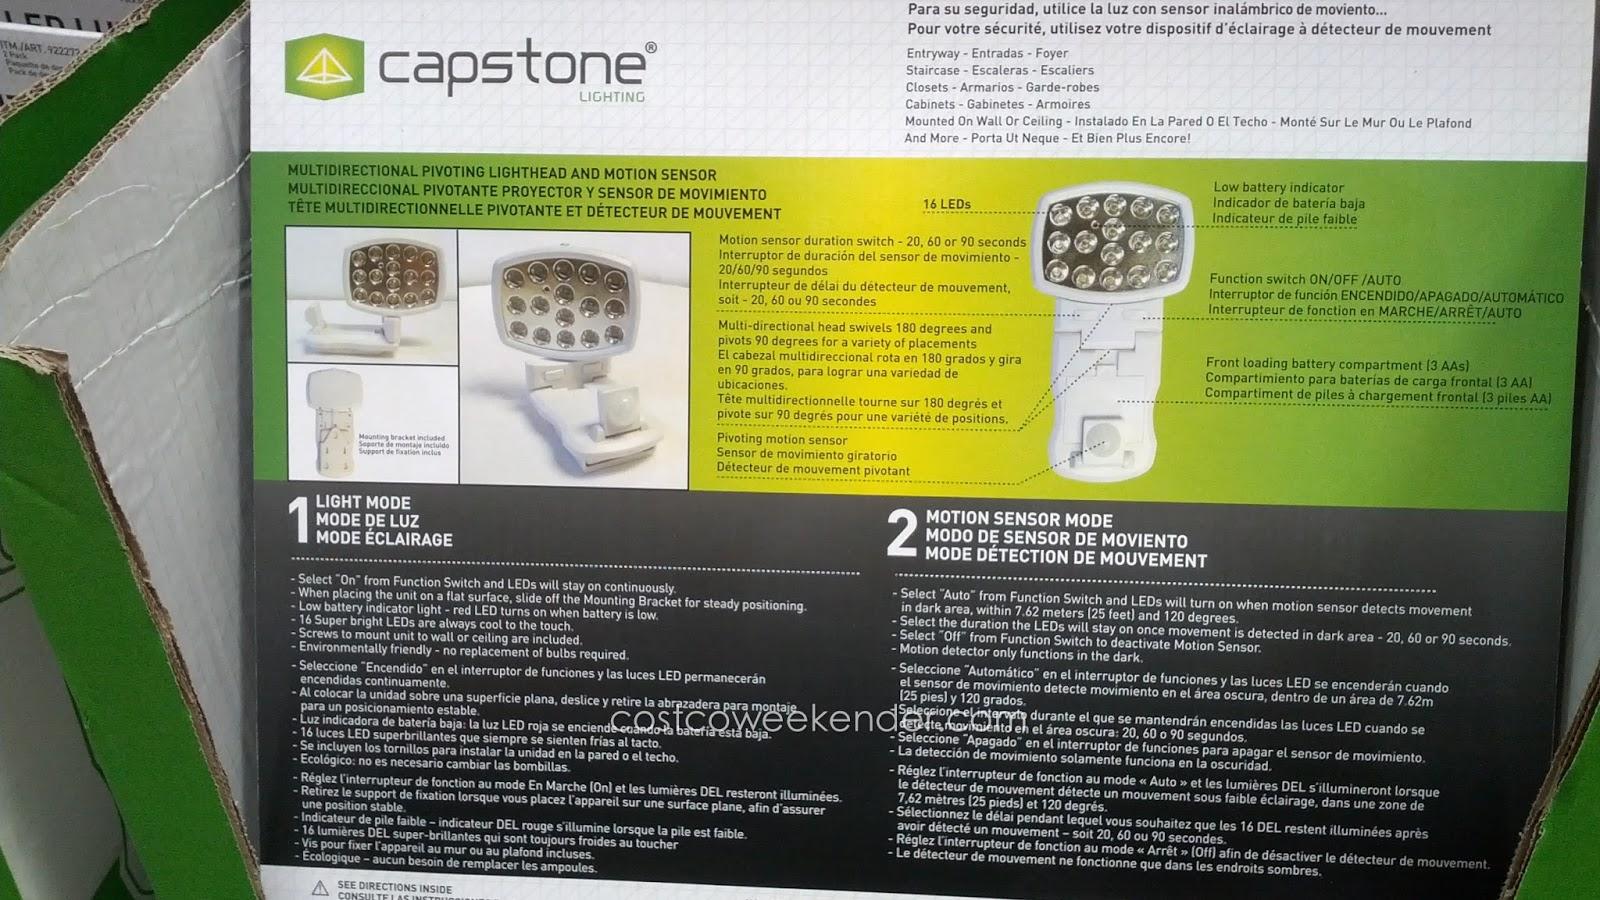 capstone led wireless motion sensor light 2 pack u2013 16 super bright leds easy